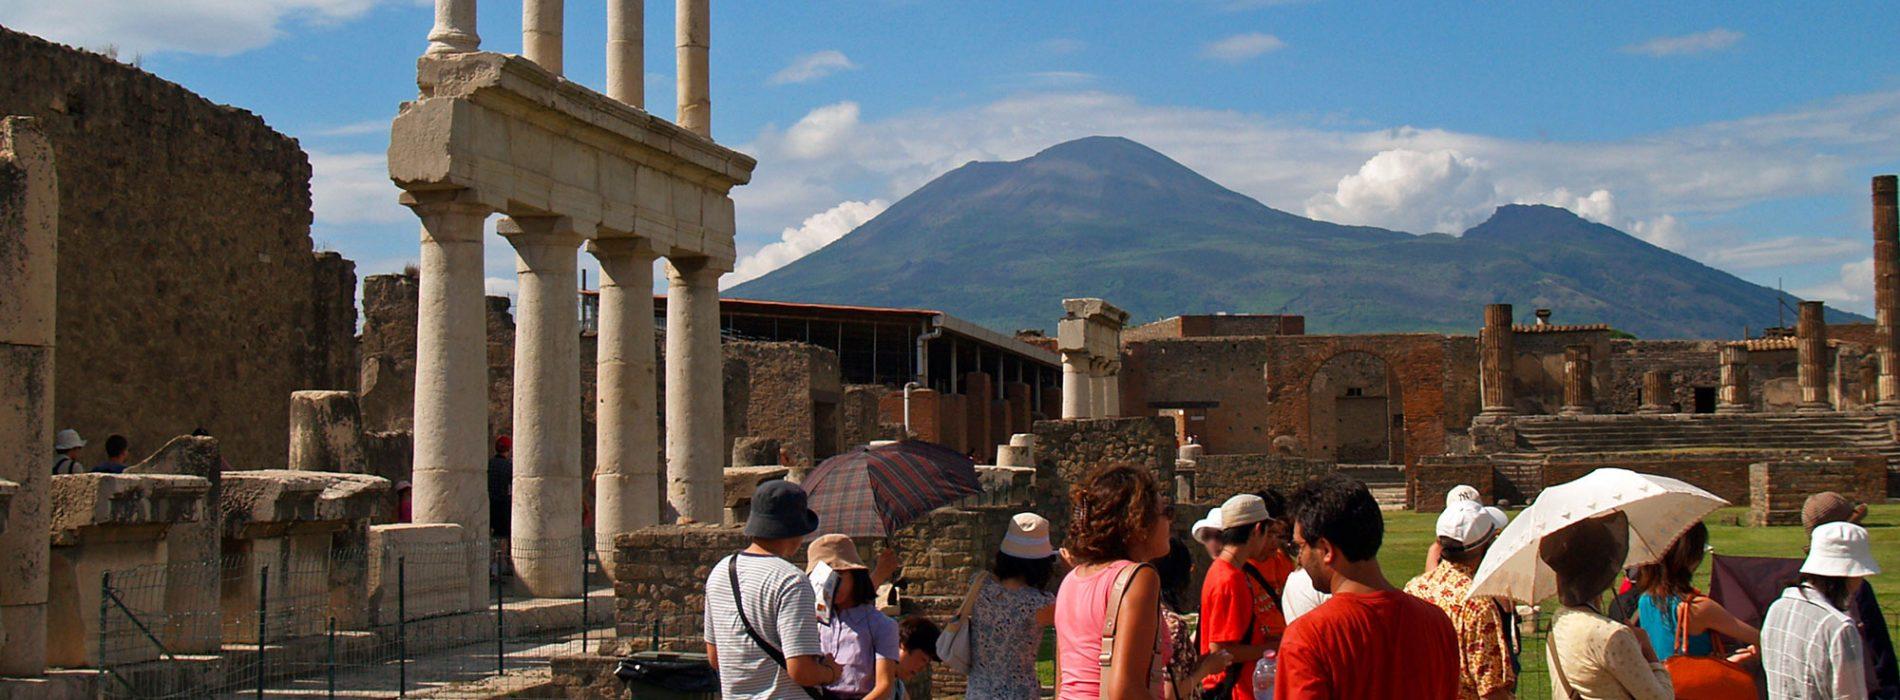 Shore Excursion from Naples Pompeii, Herculaneum and Positano